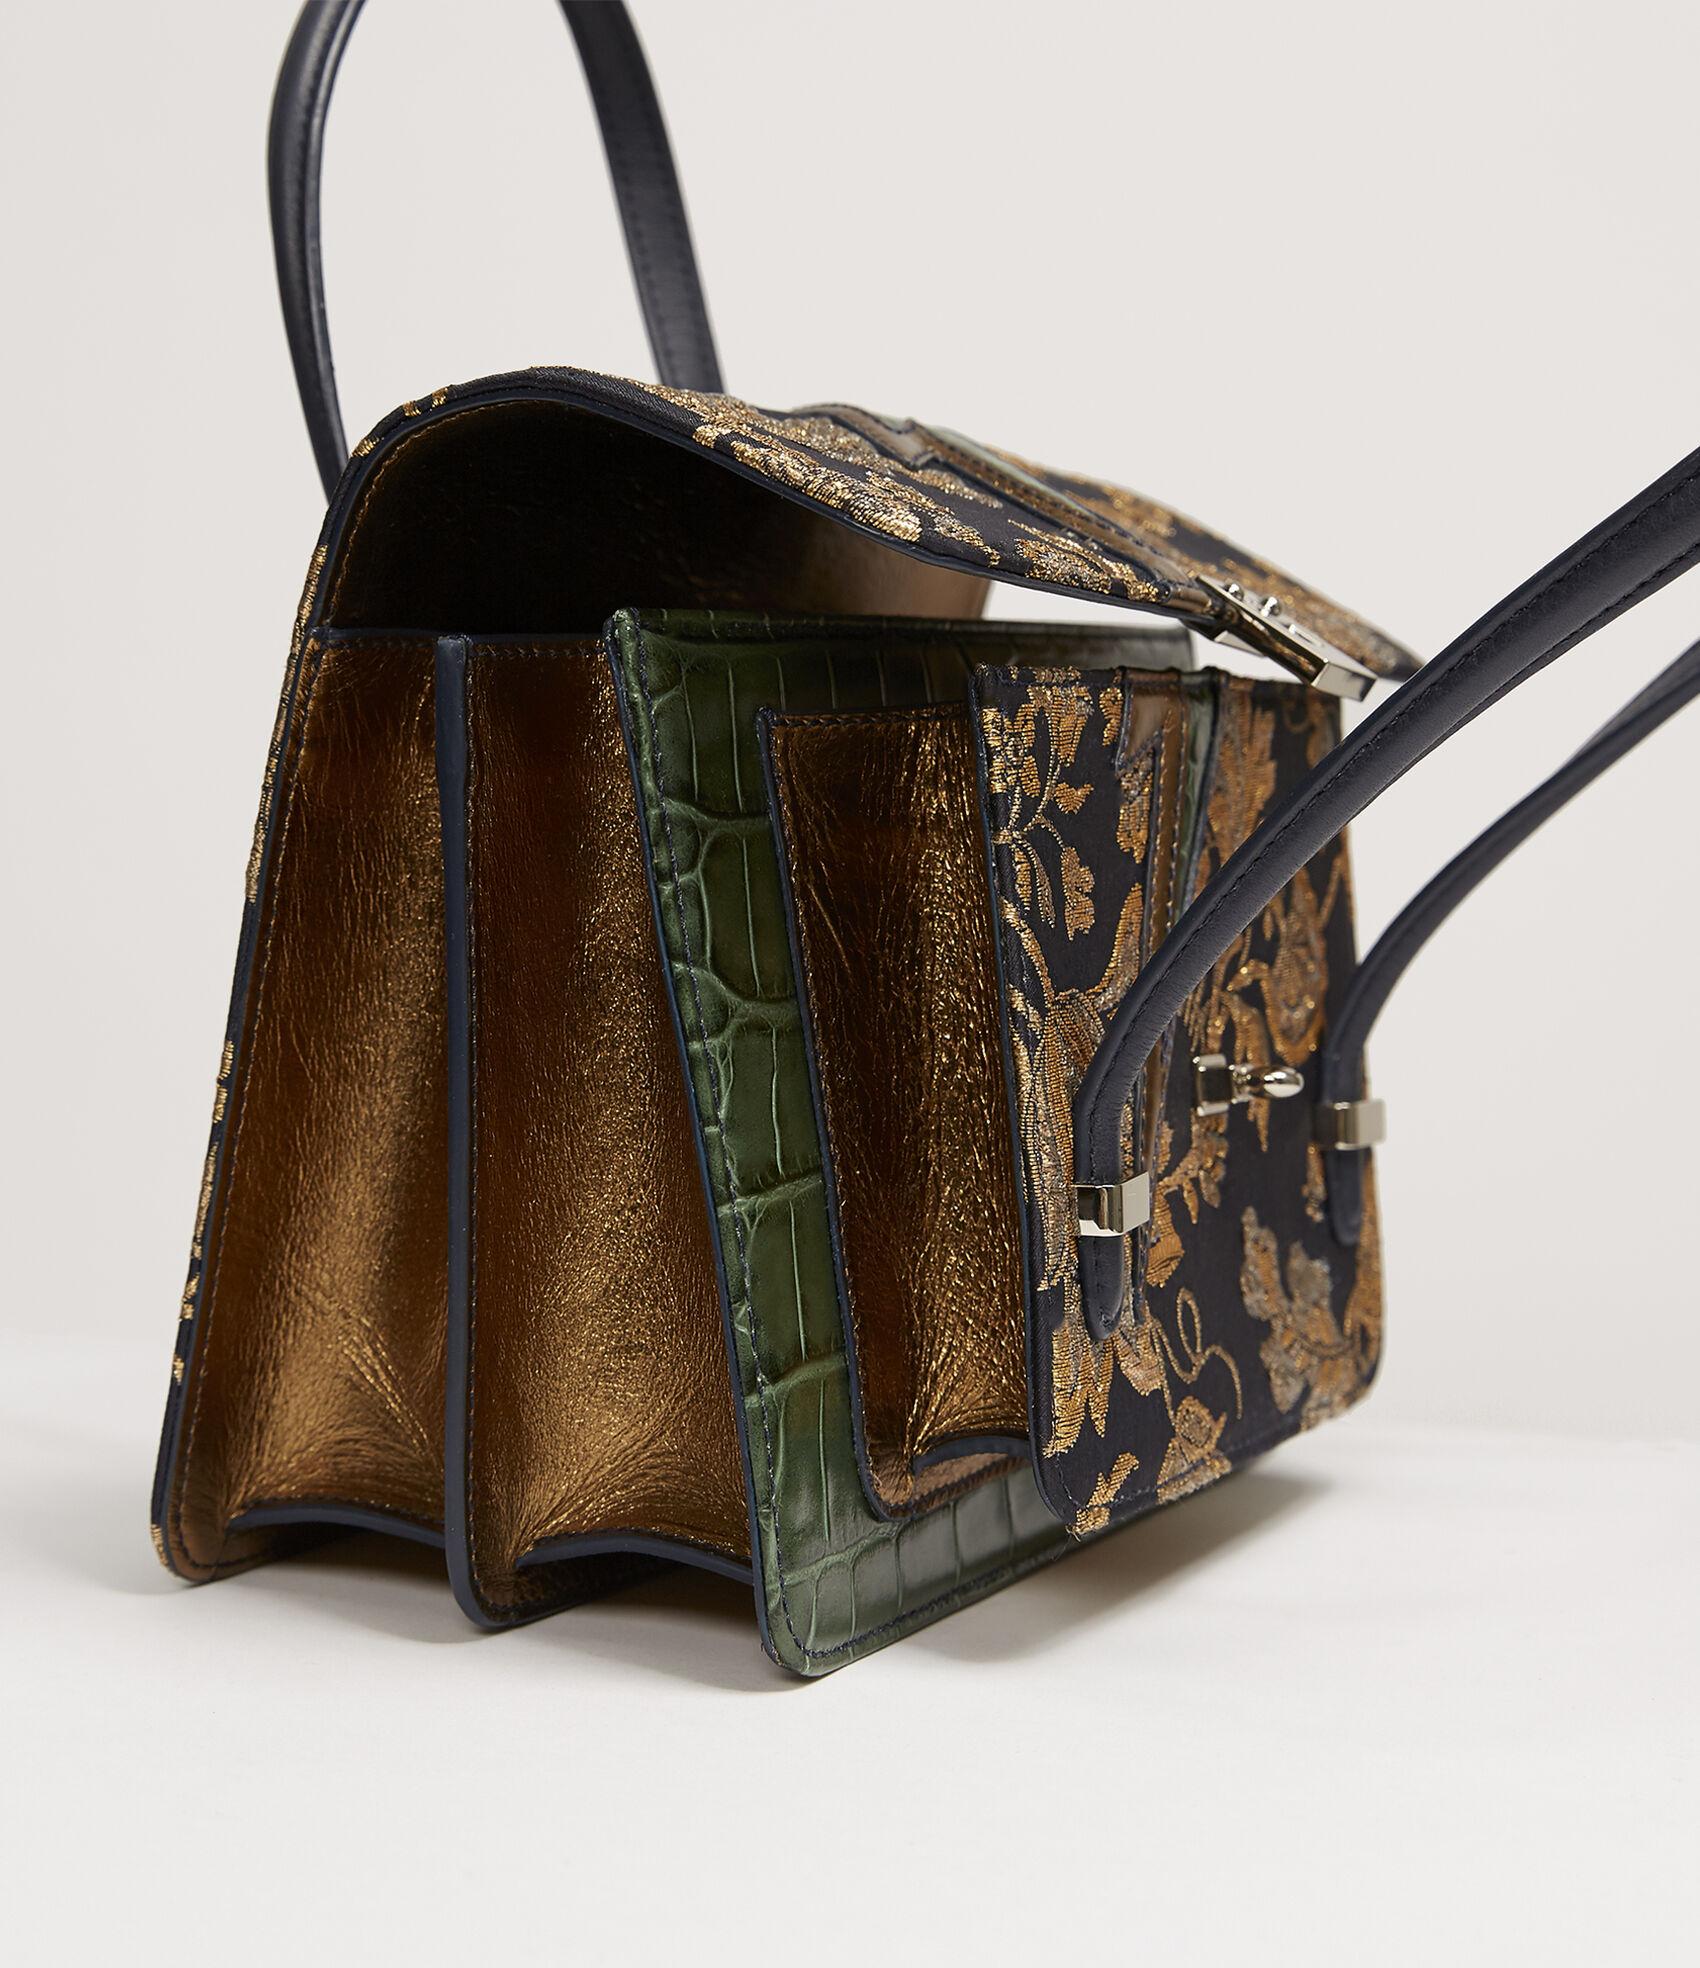 6df6e4d45daa Vivienne Westwood Handbags